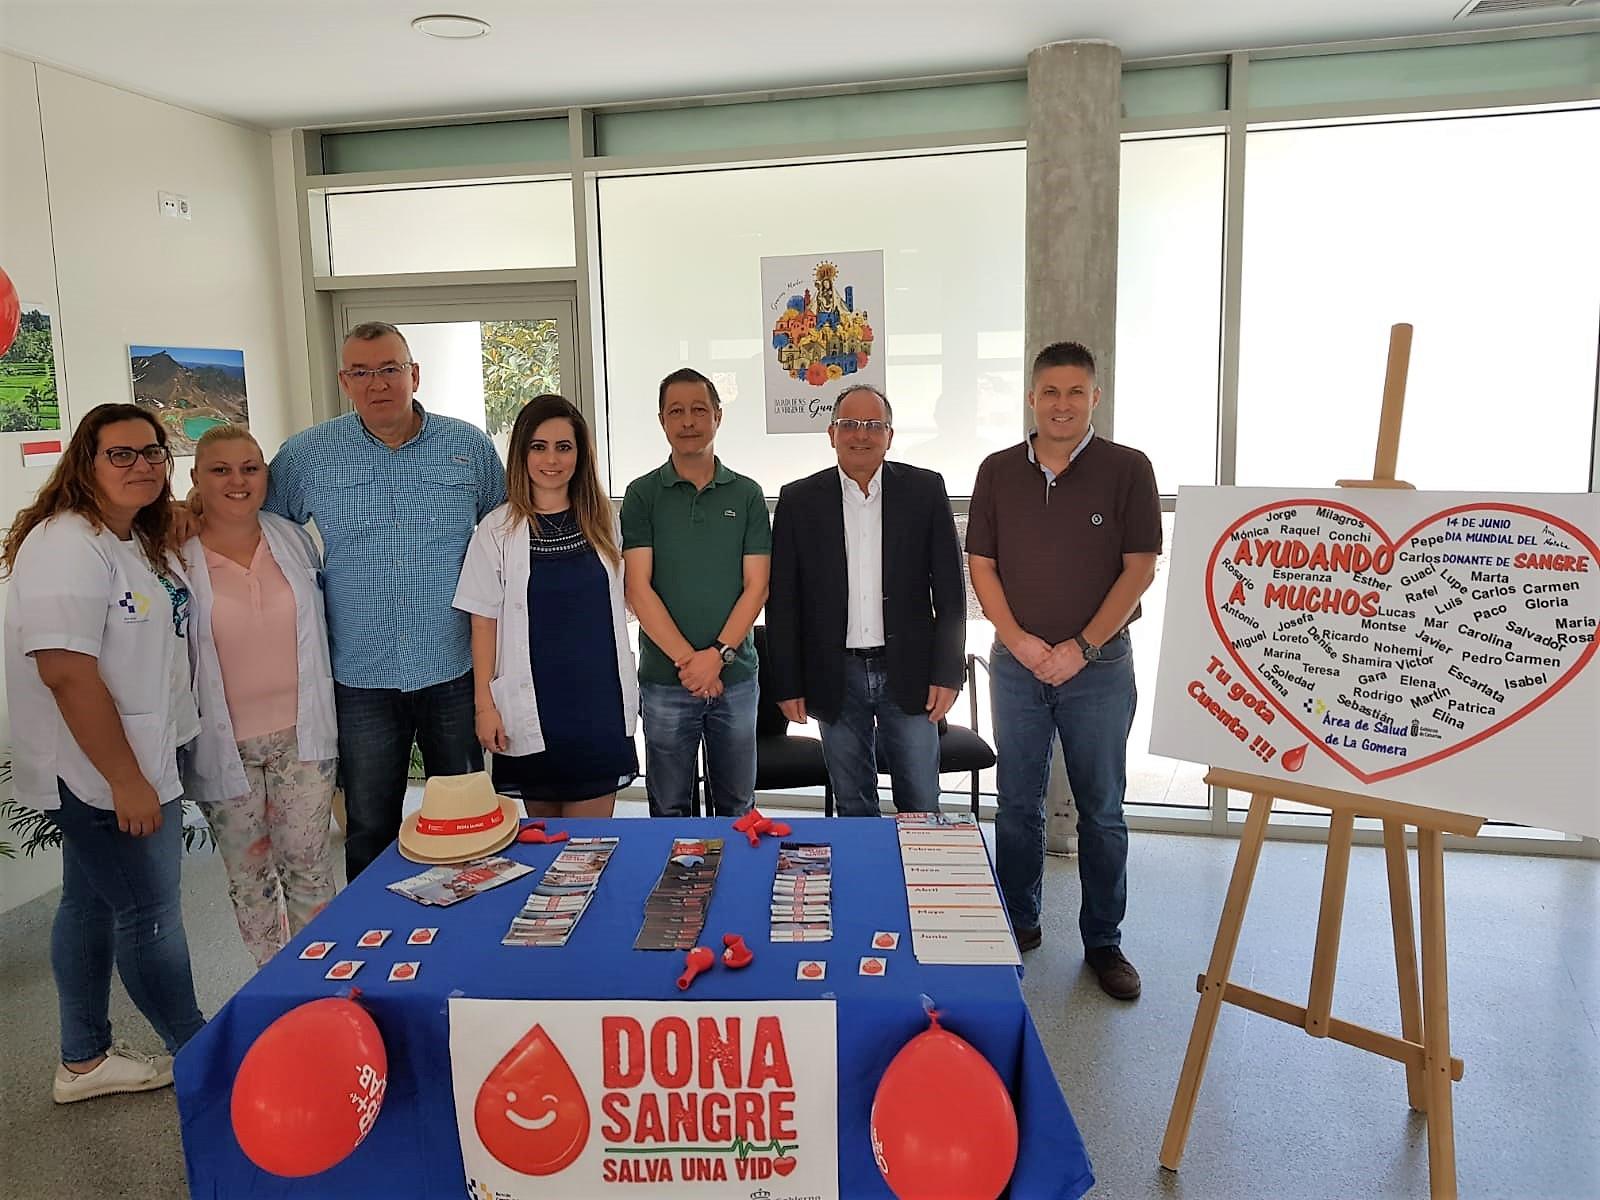 DM Donante de sangre La Gomera